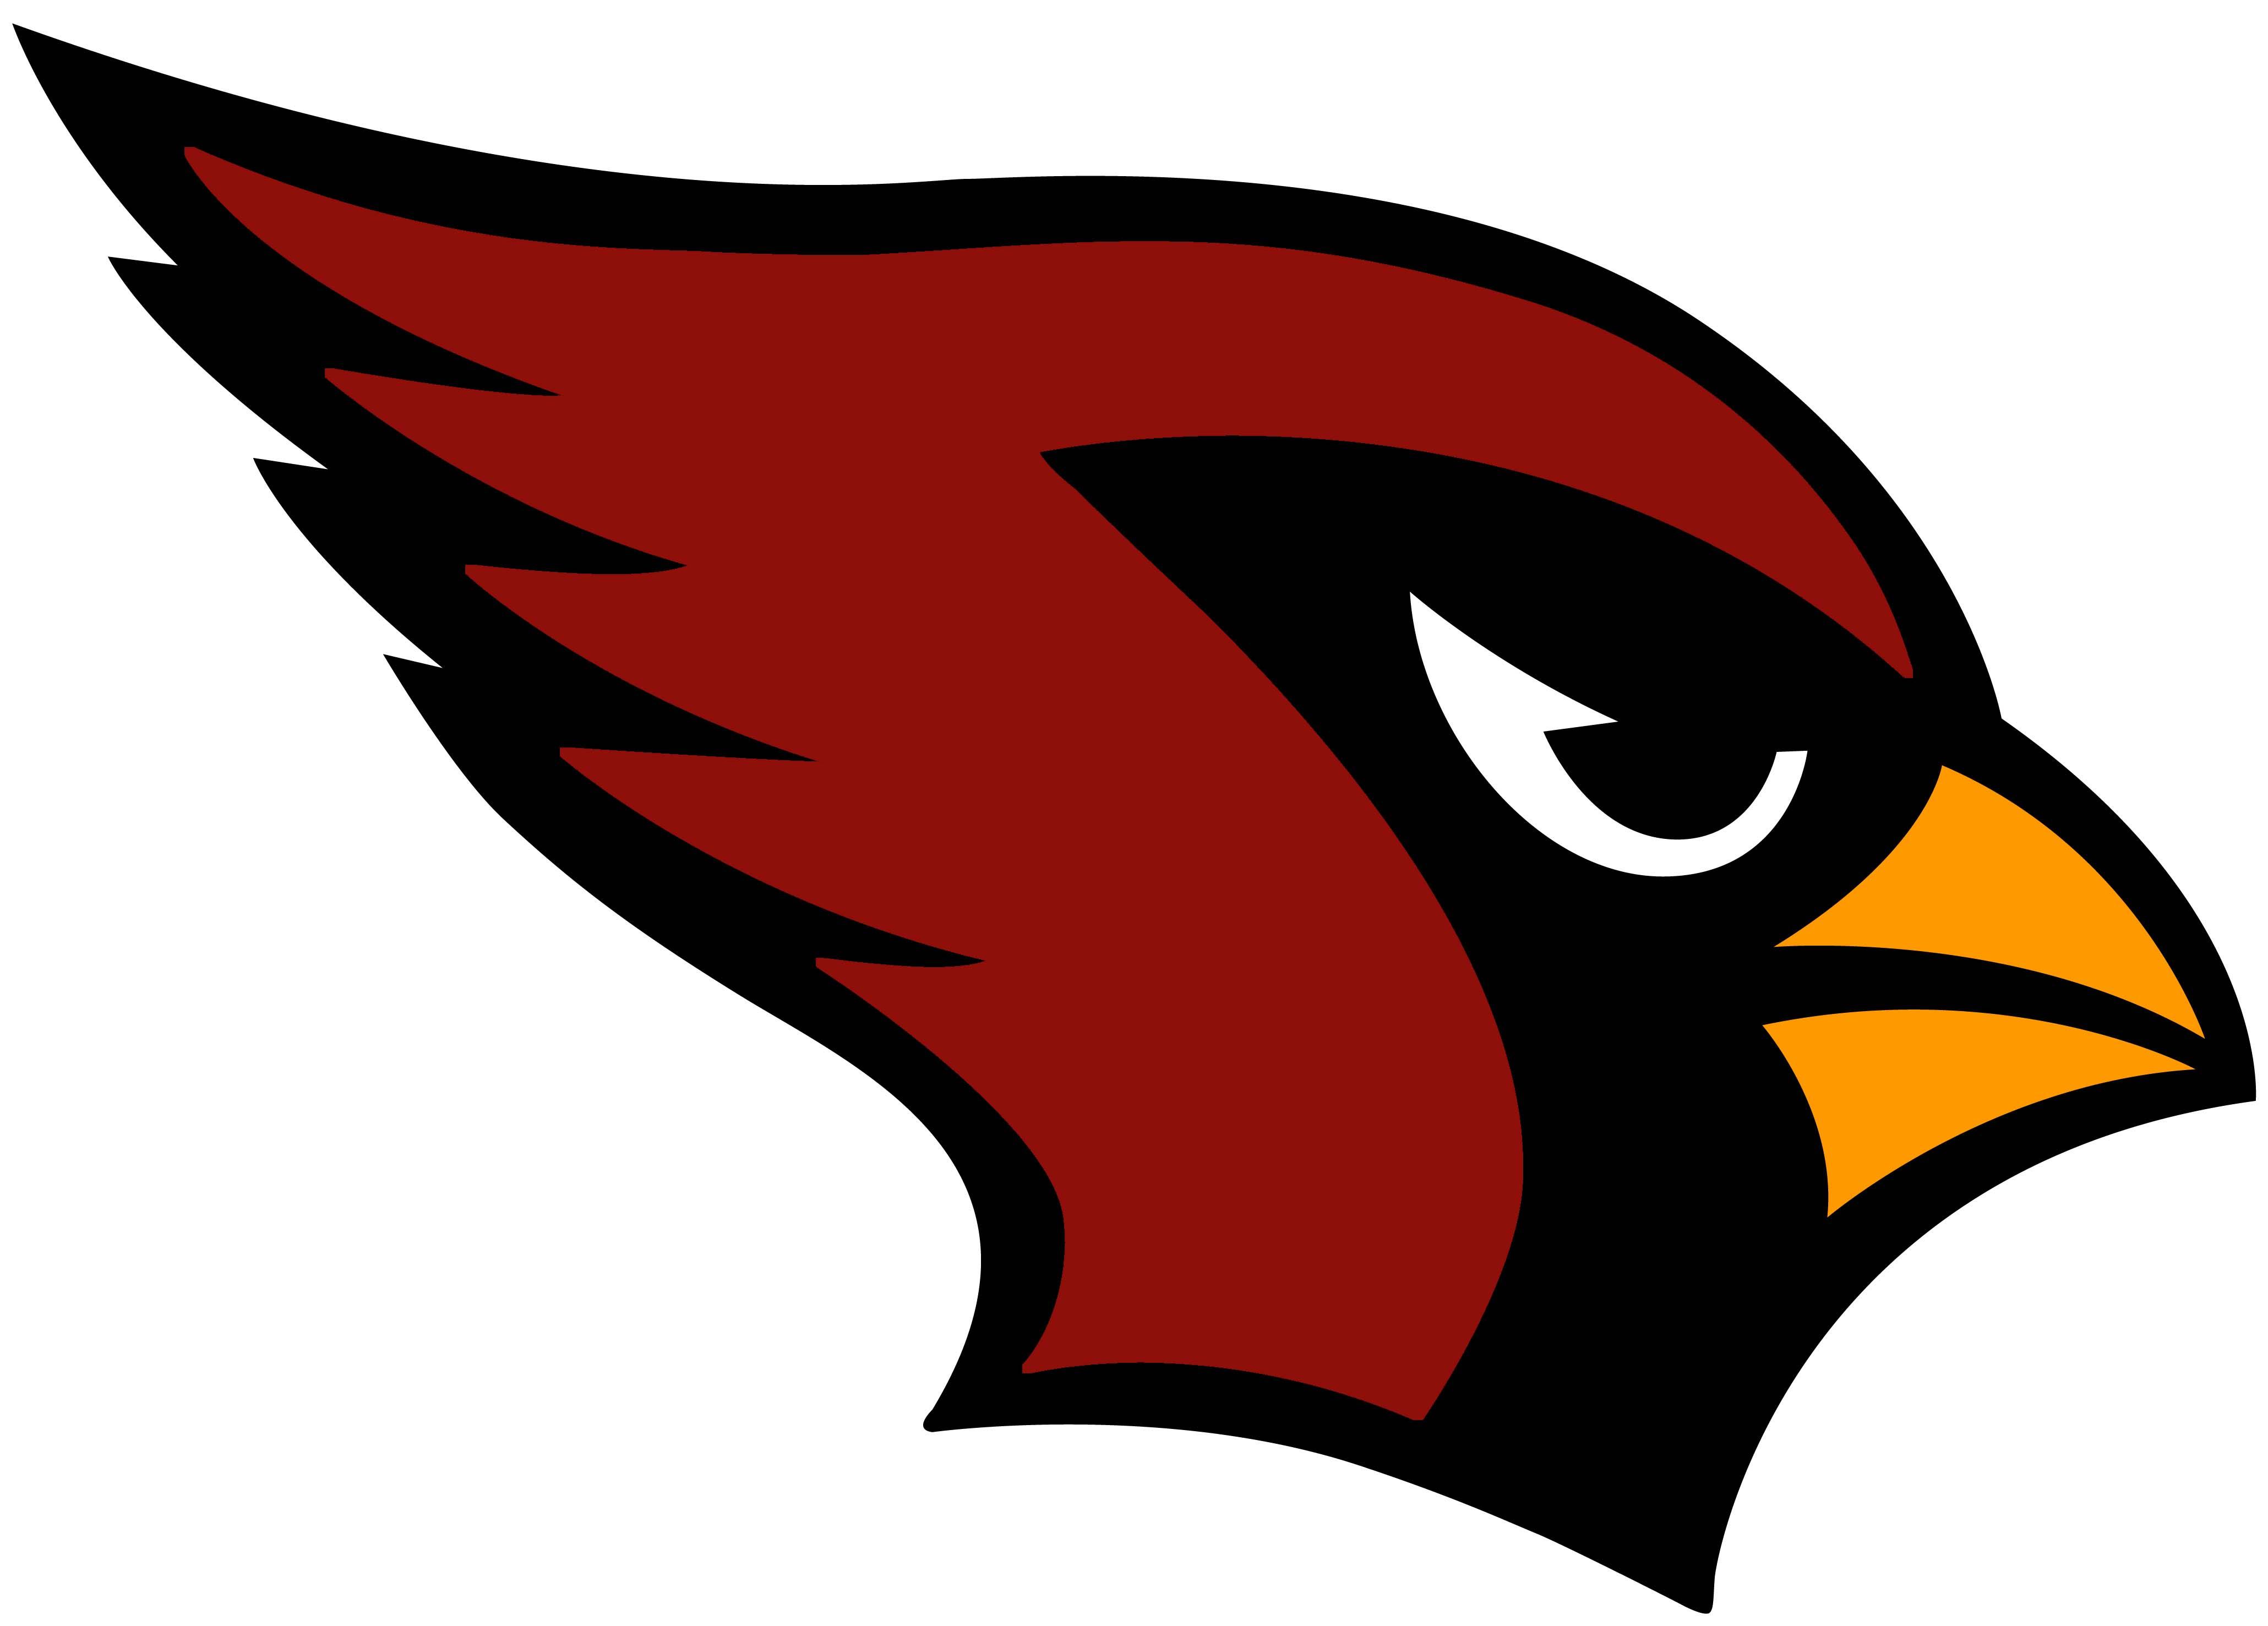 Cardinal clipart cardinal face. Free cliparts download clip